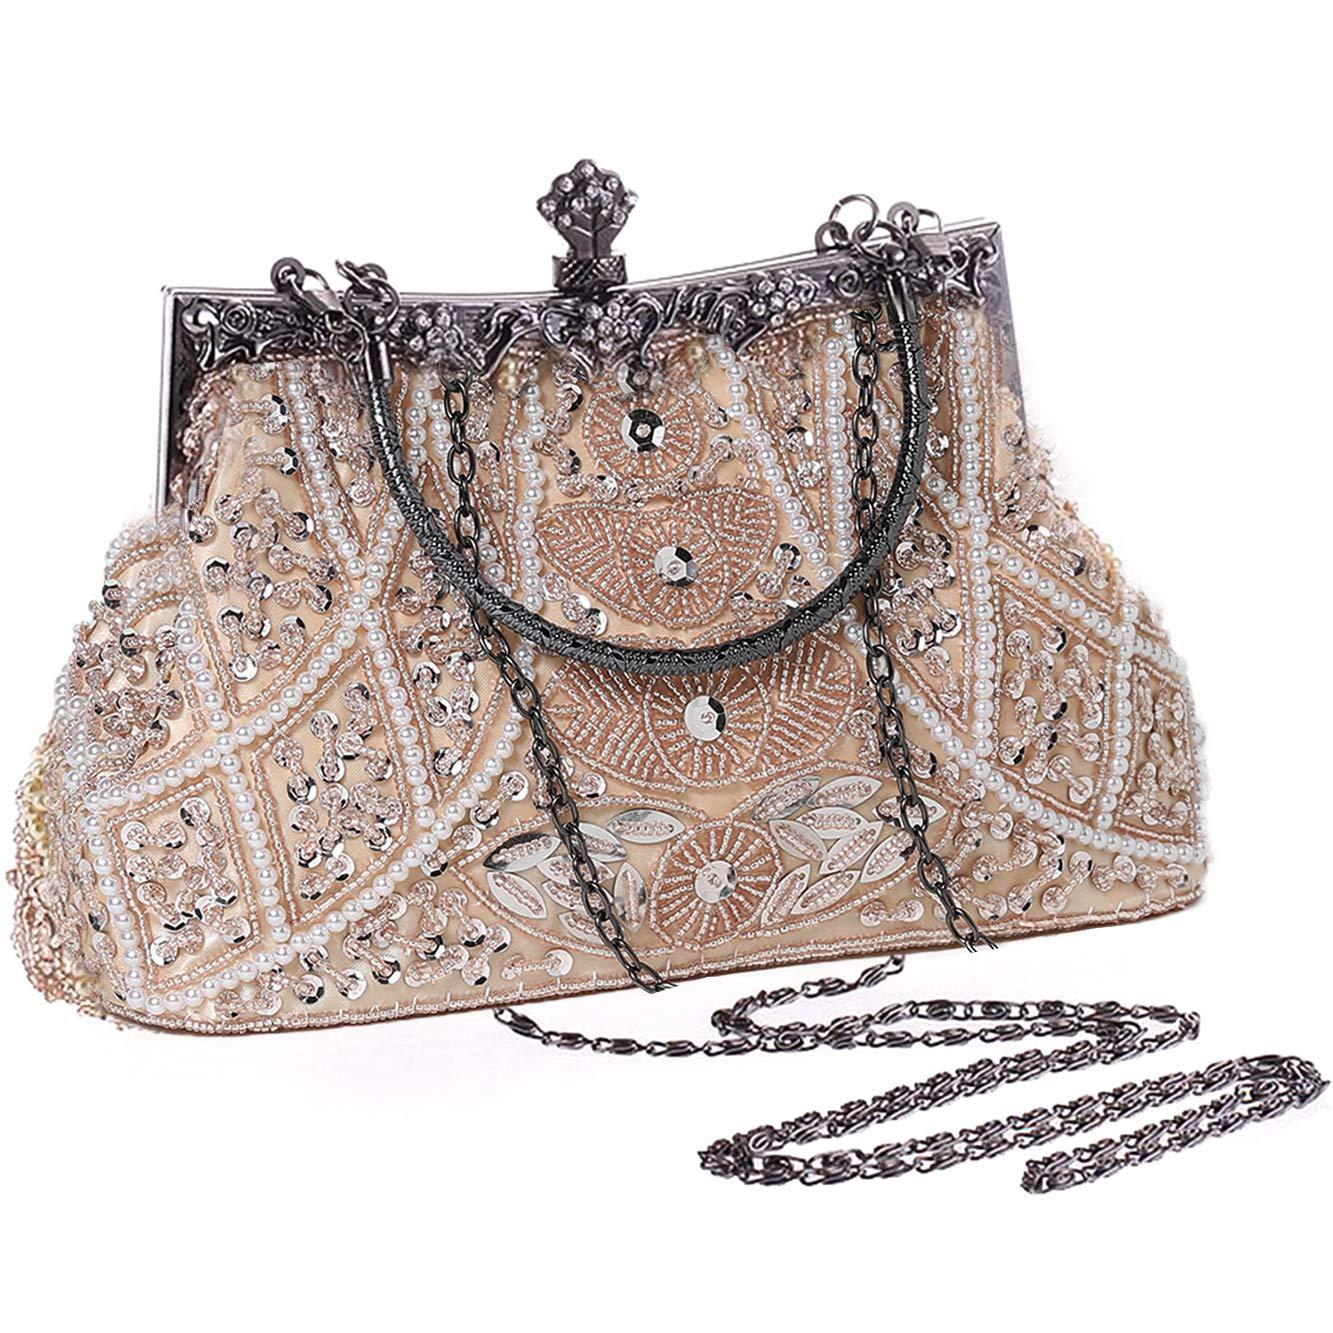 BABEYOND 1920s Flapper Clutch Gatsby Pearl Handbag Roaring 20s Evening Clutch Beaded Bag 1920s Gatsby Costume Accessories (Beige)